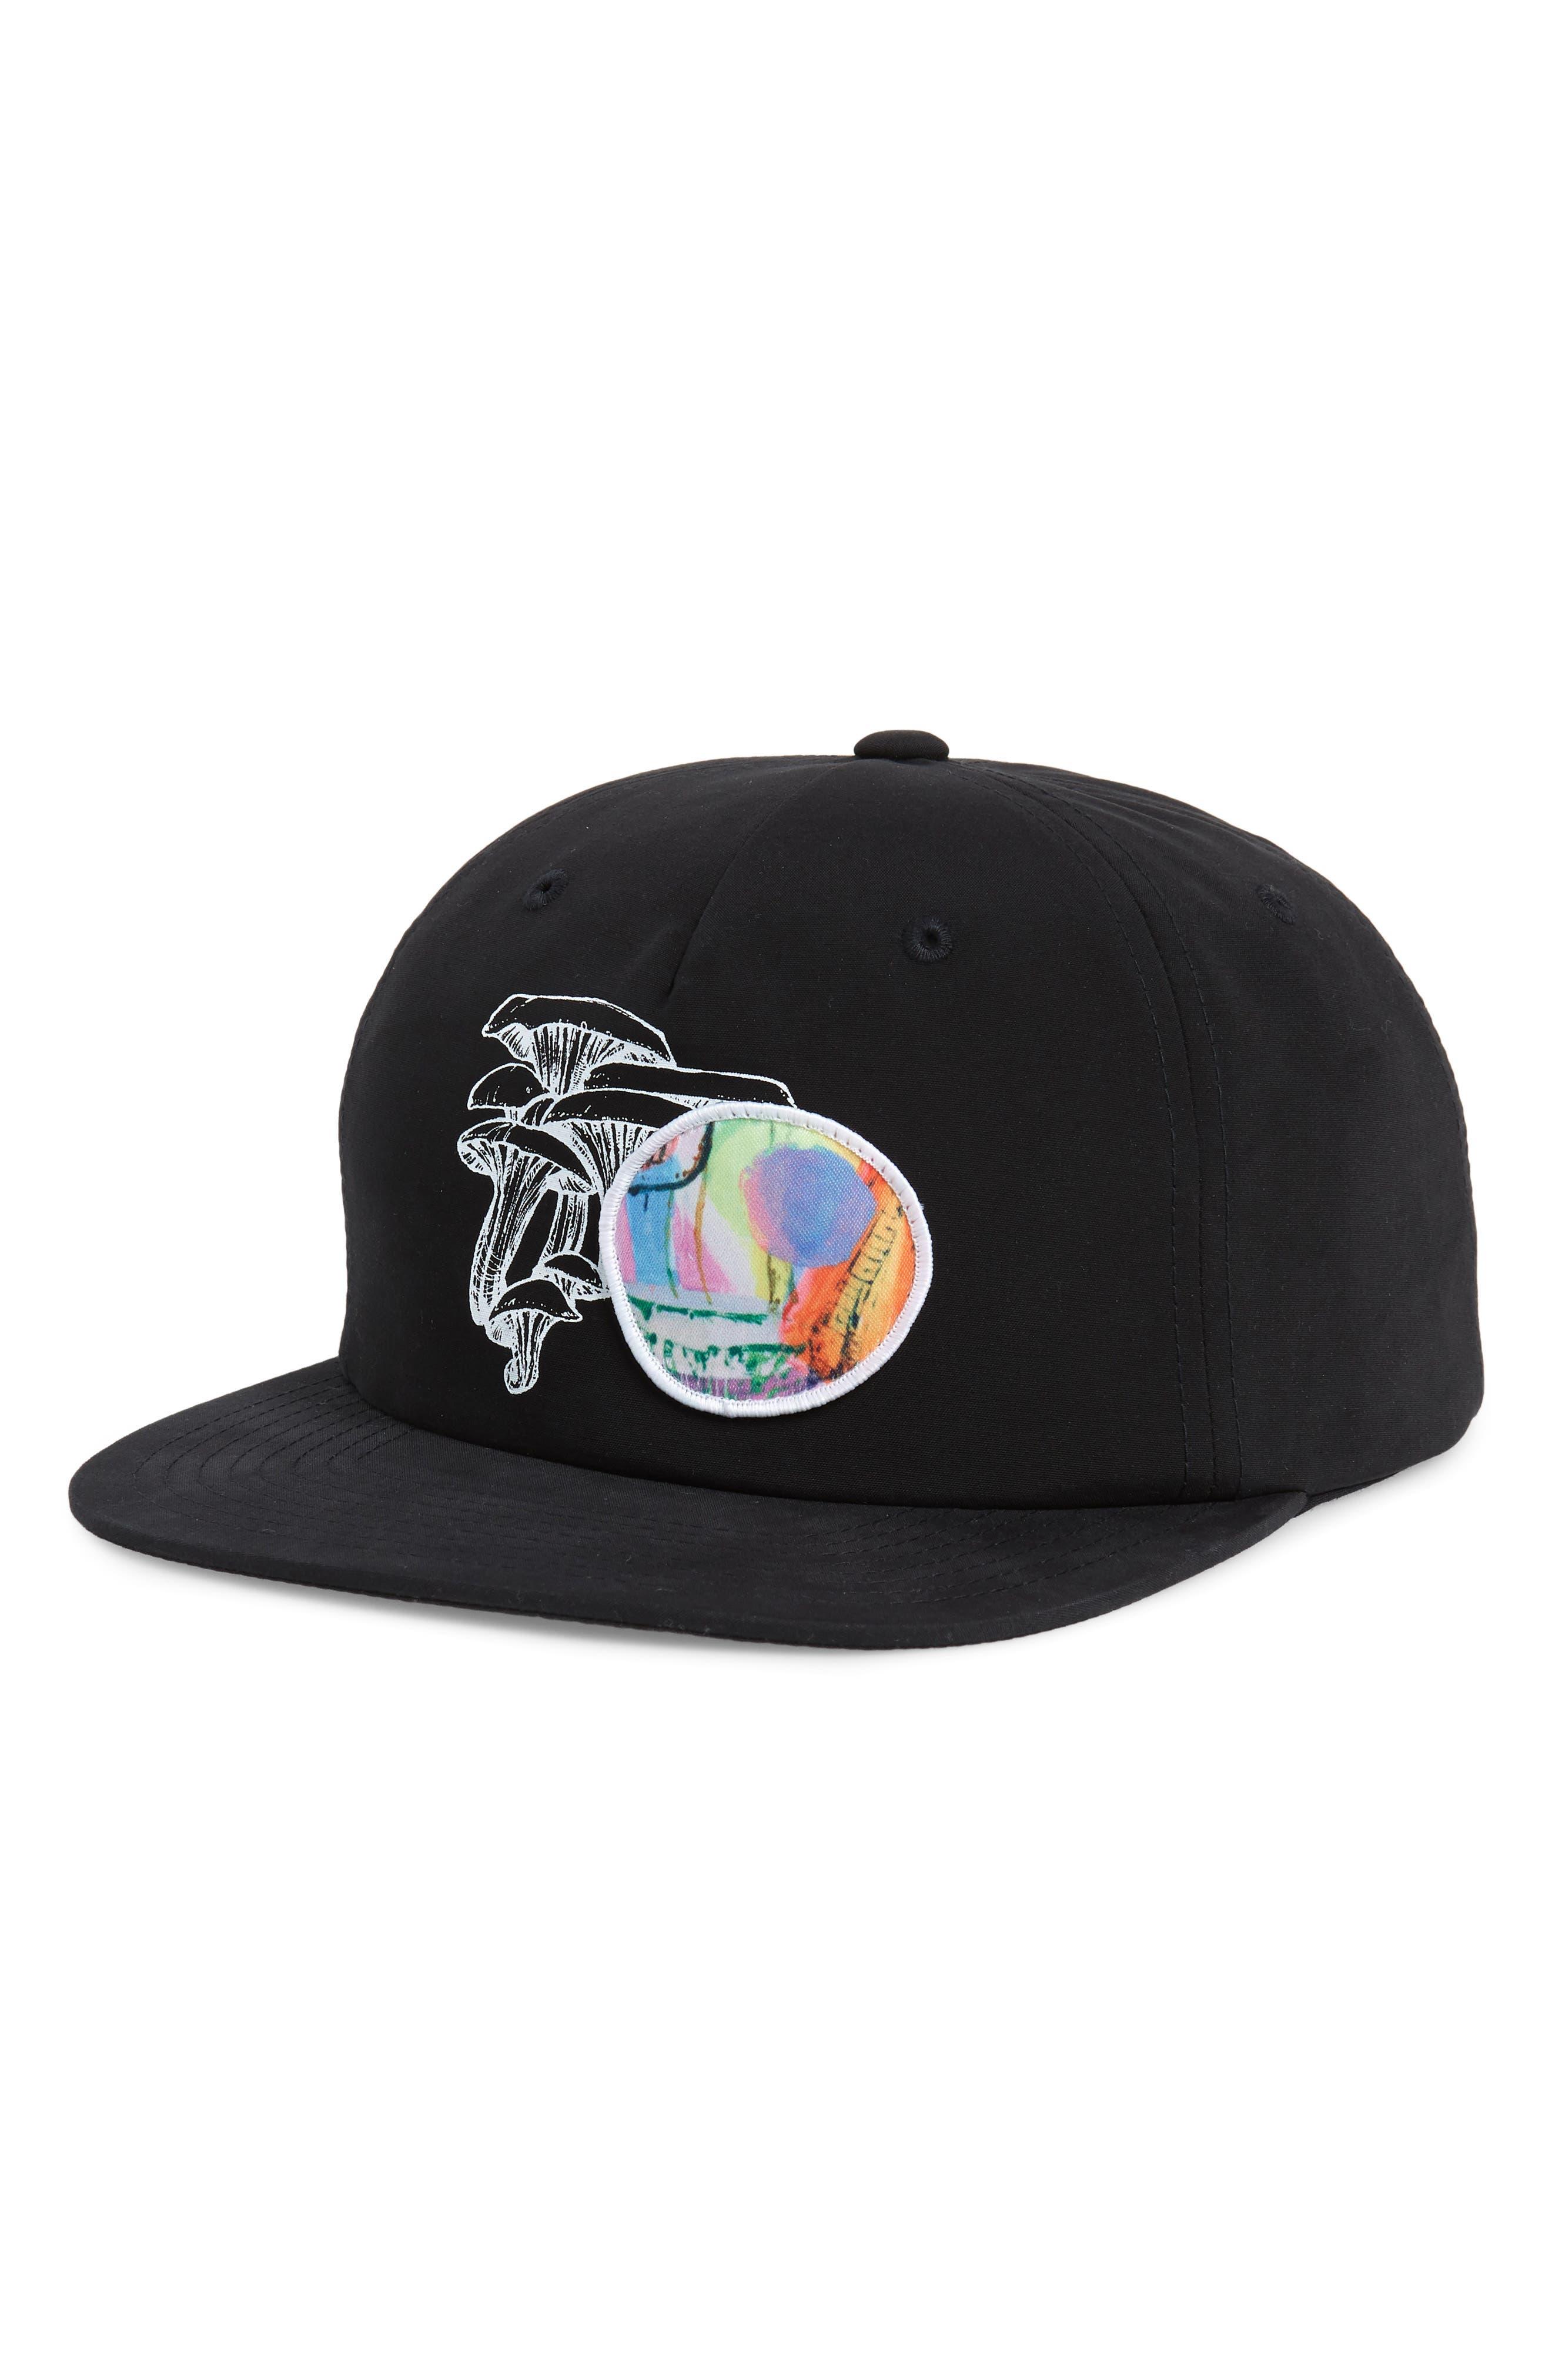 RVCA, Sage Vaughn Snapback Baseball Cap, Main thumbnail 1, color, BLACK